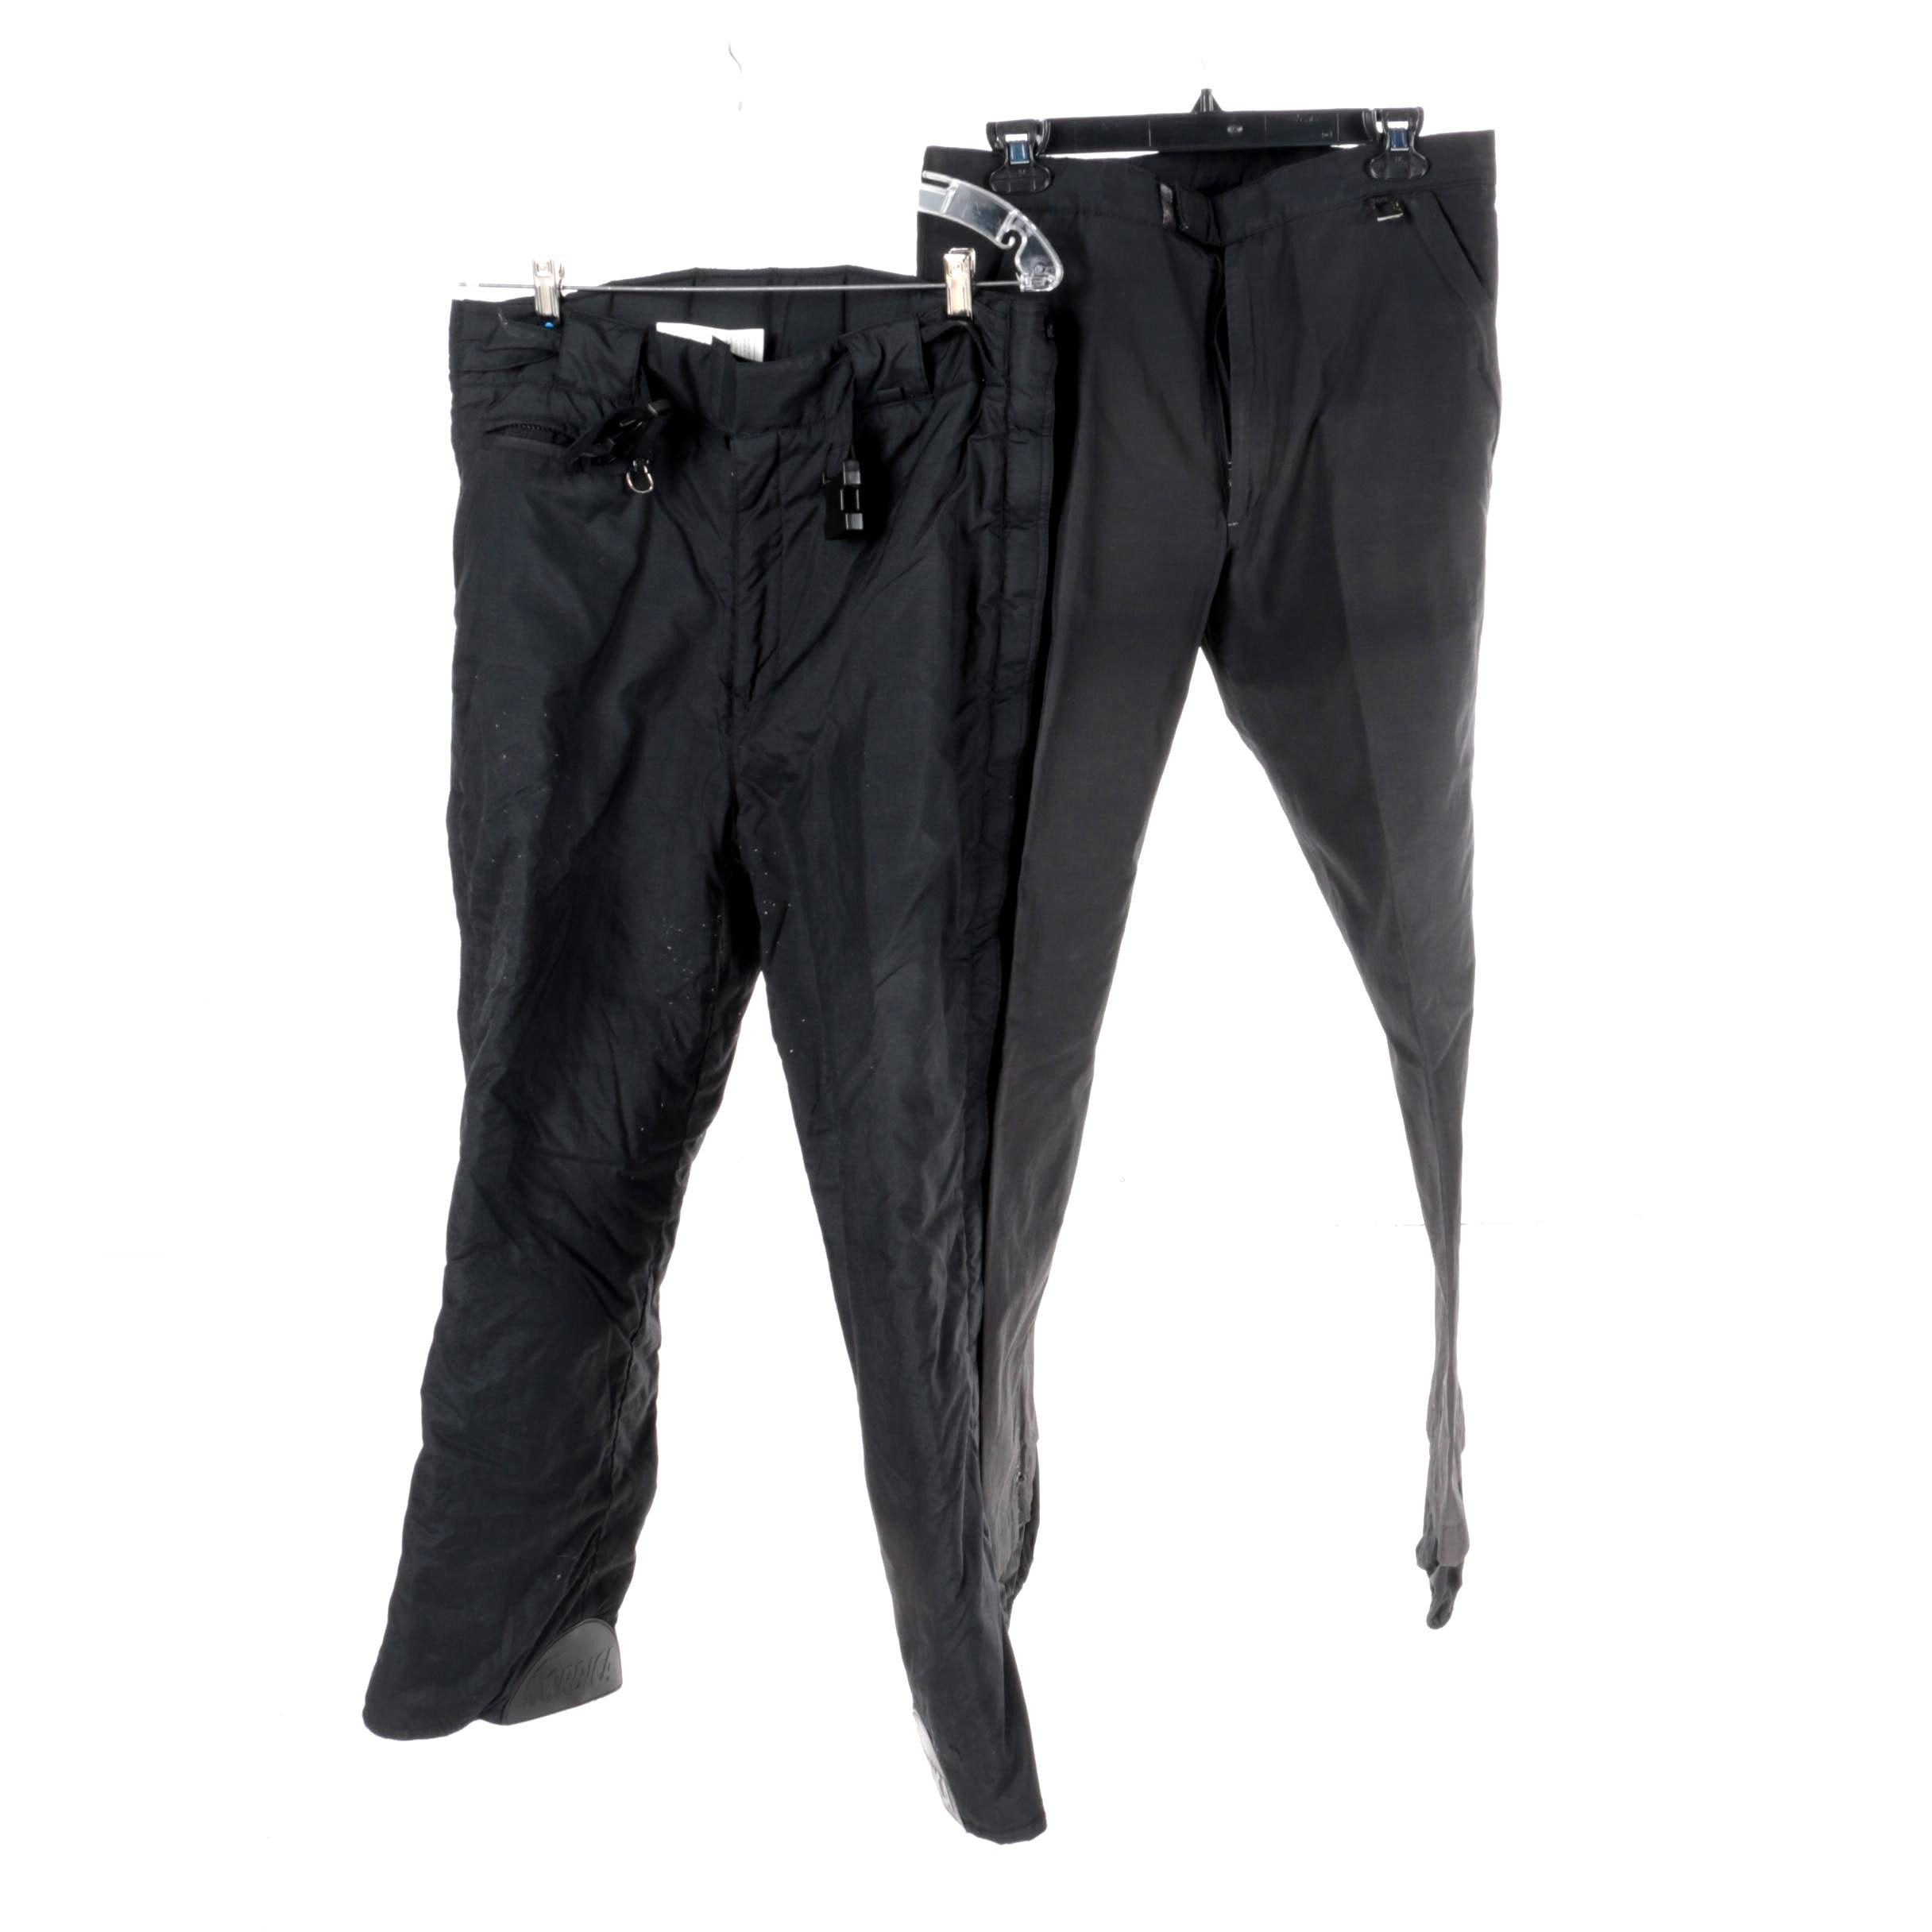 Women's Fera and Nordica Ski Pants